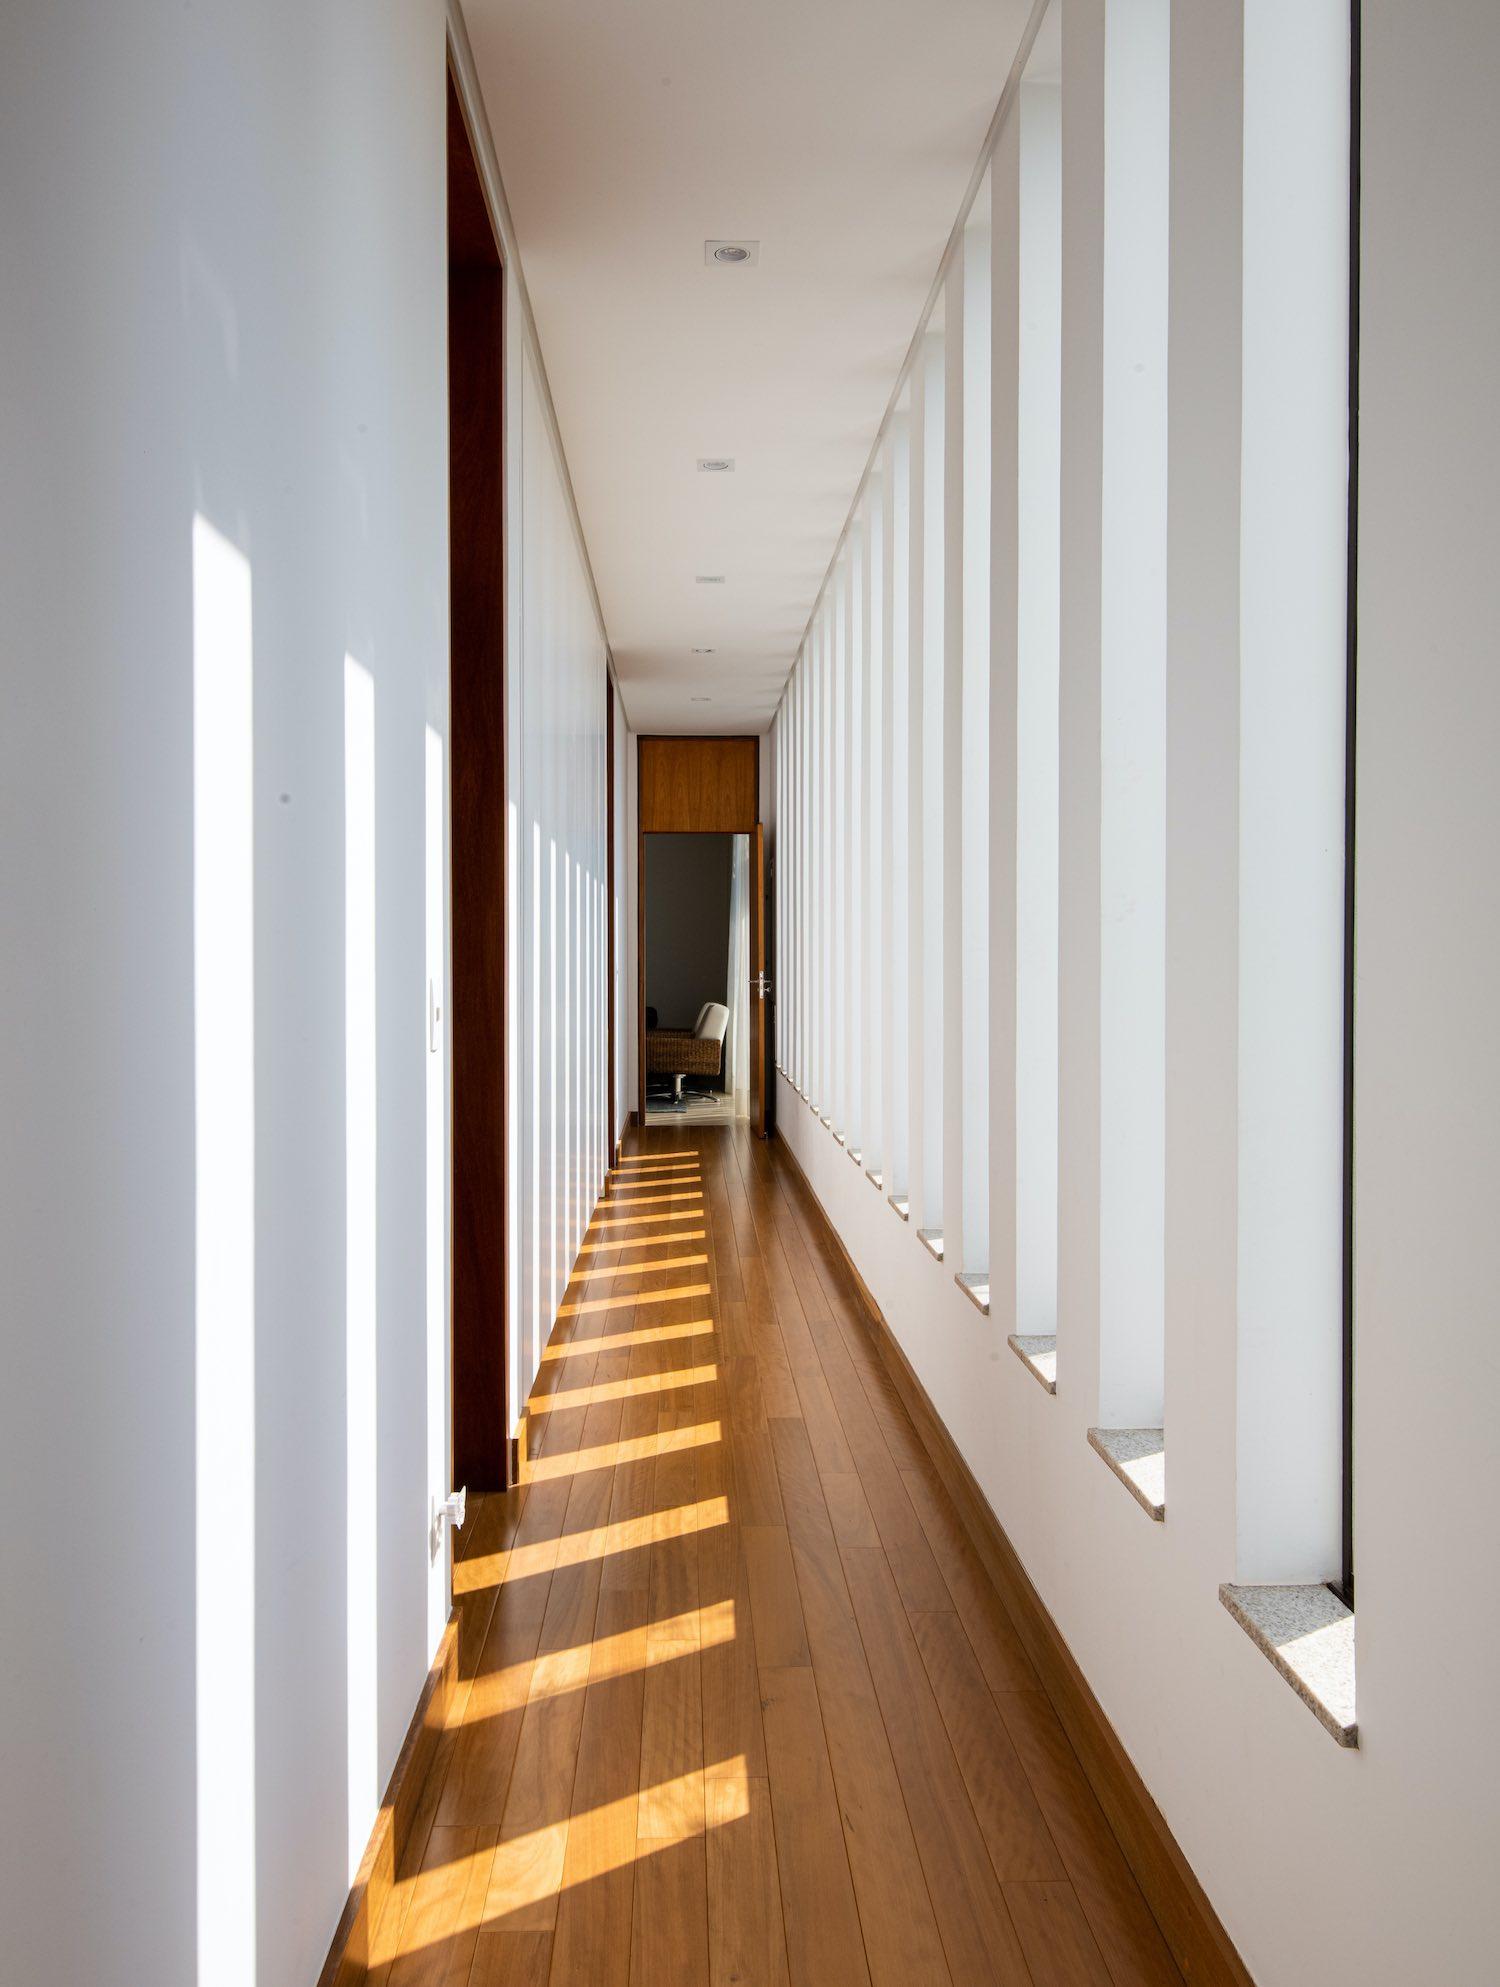 corridor with lathe windows and curtain